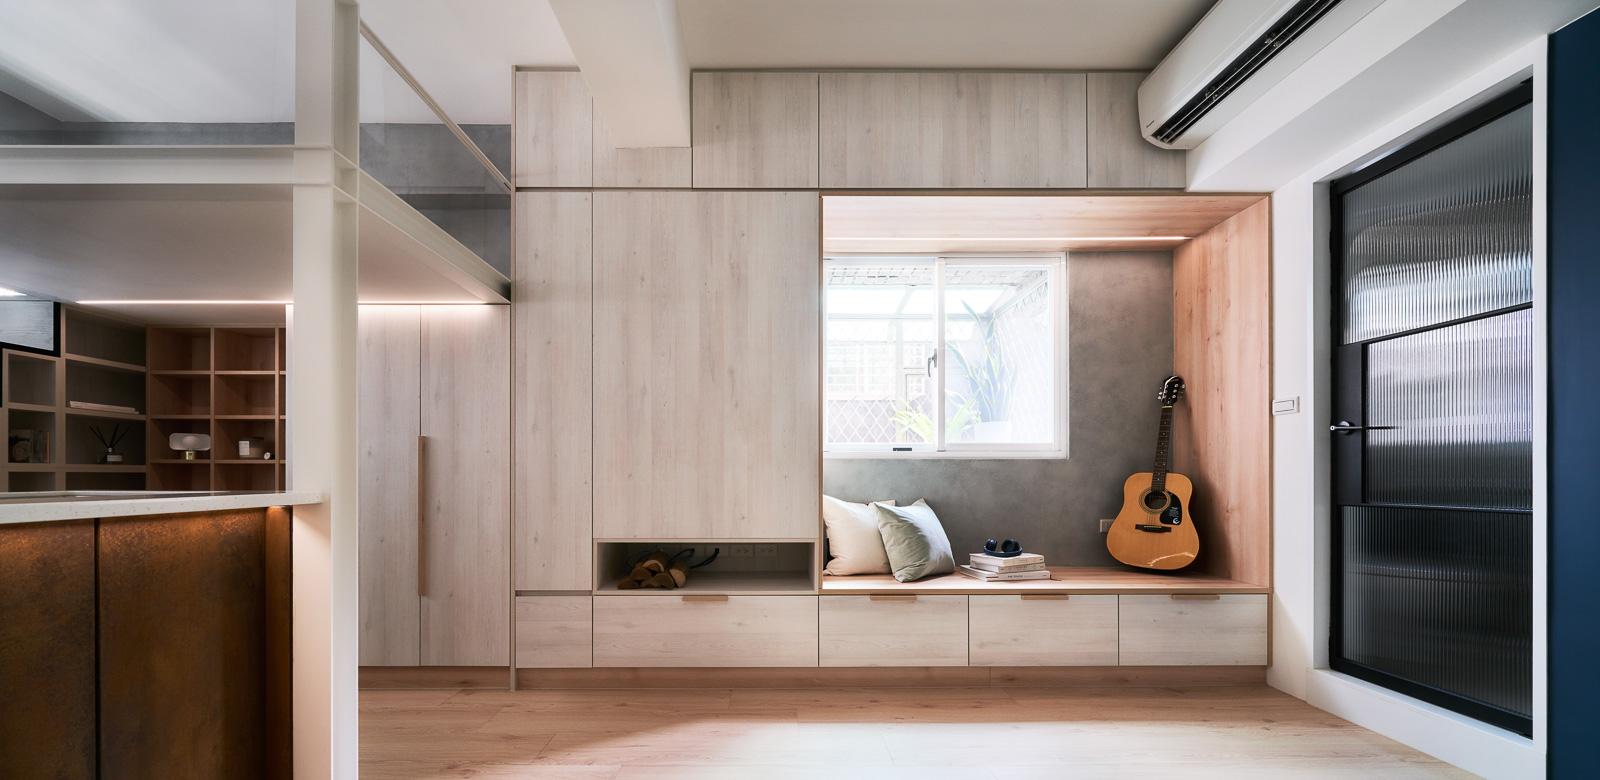 NestSpace_SmallHouse_S-074